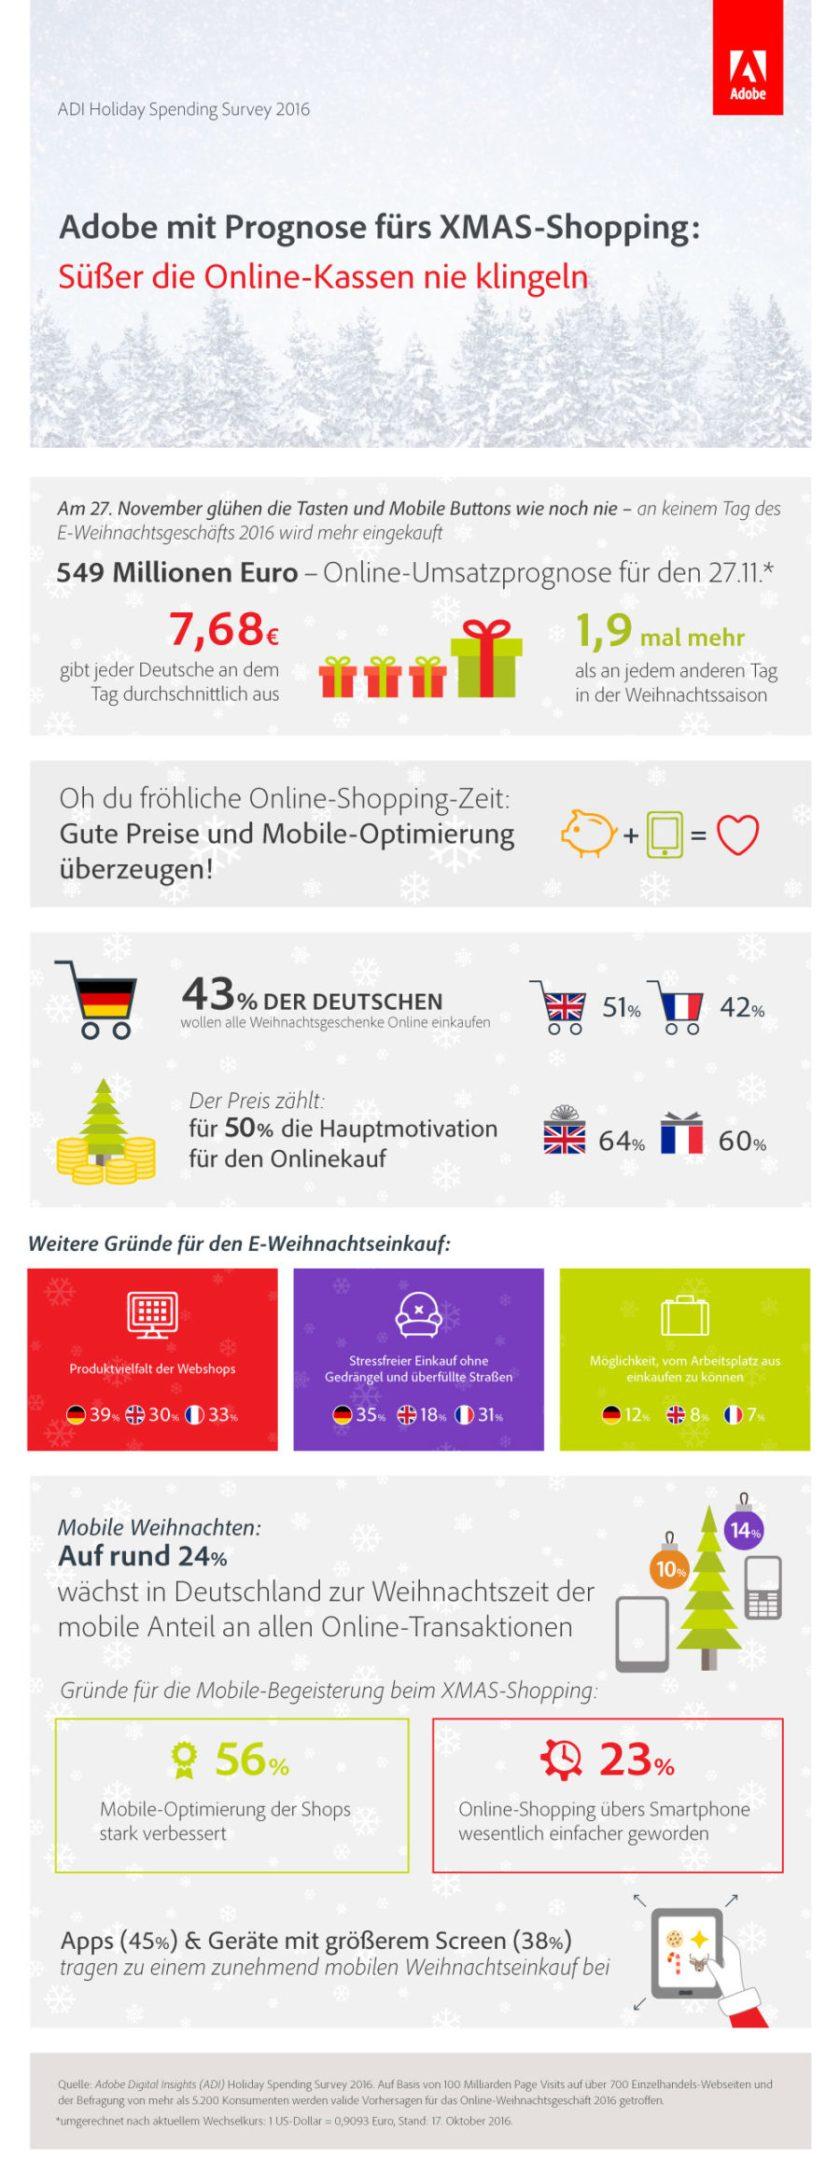 Infografik Weihnachten E-Commerce (Bild: Adobe)